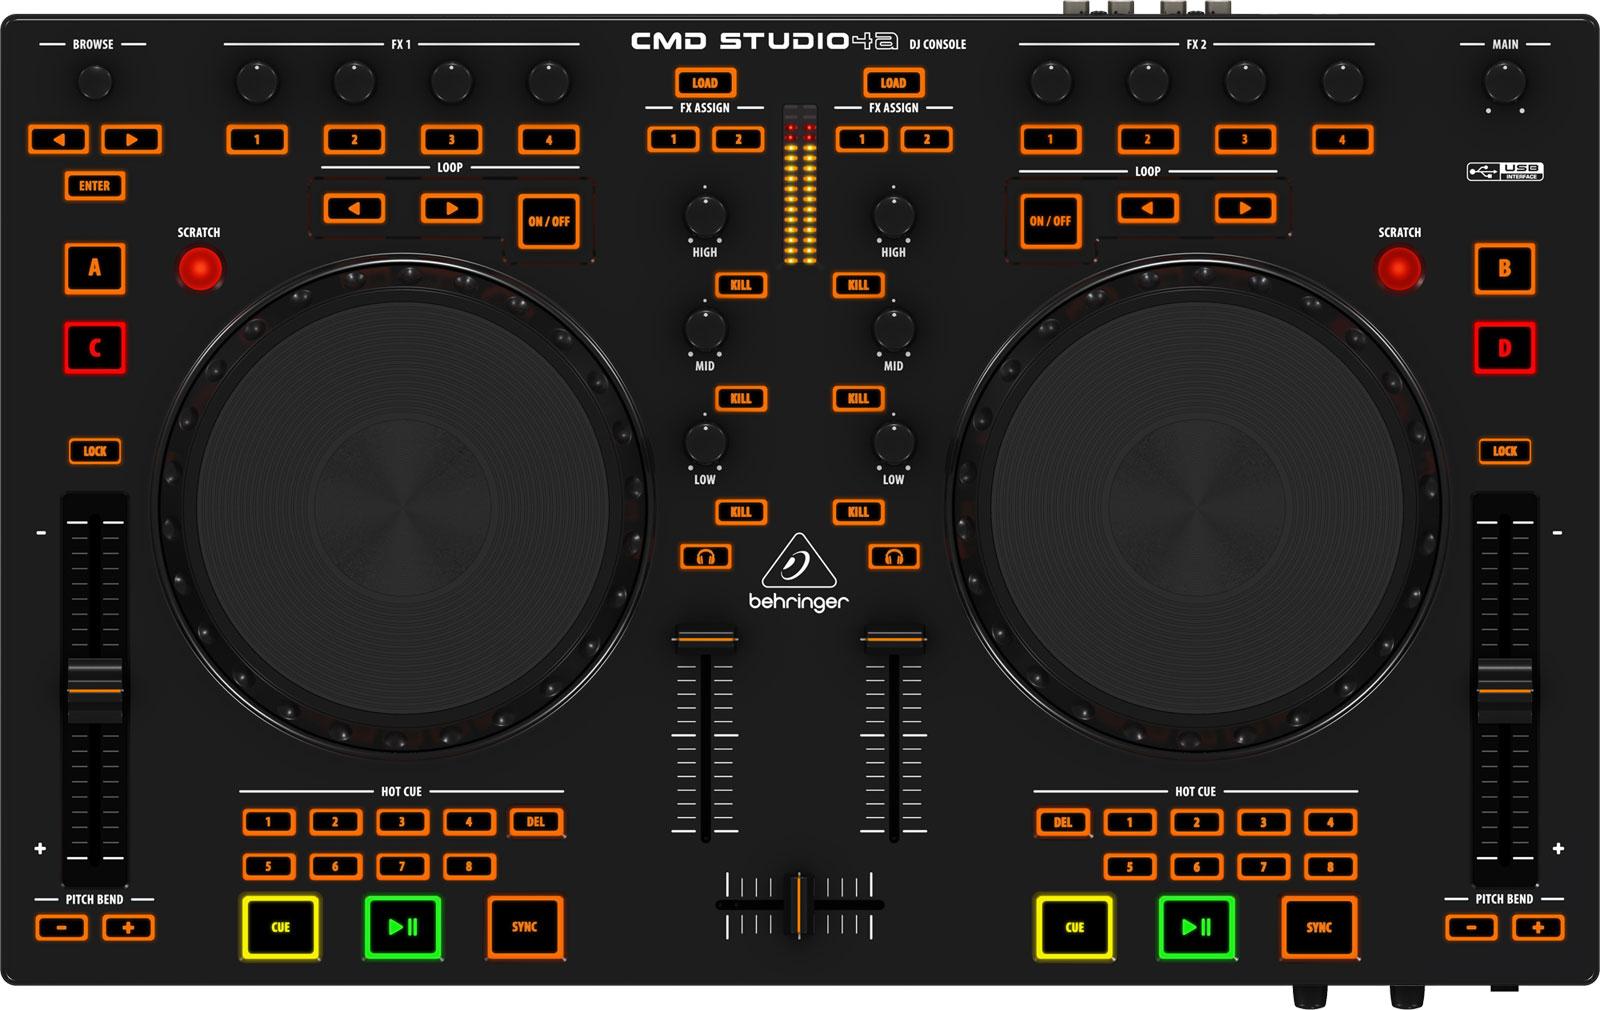 Midi Deck Controller 4-deck dj Midi